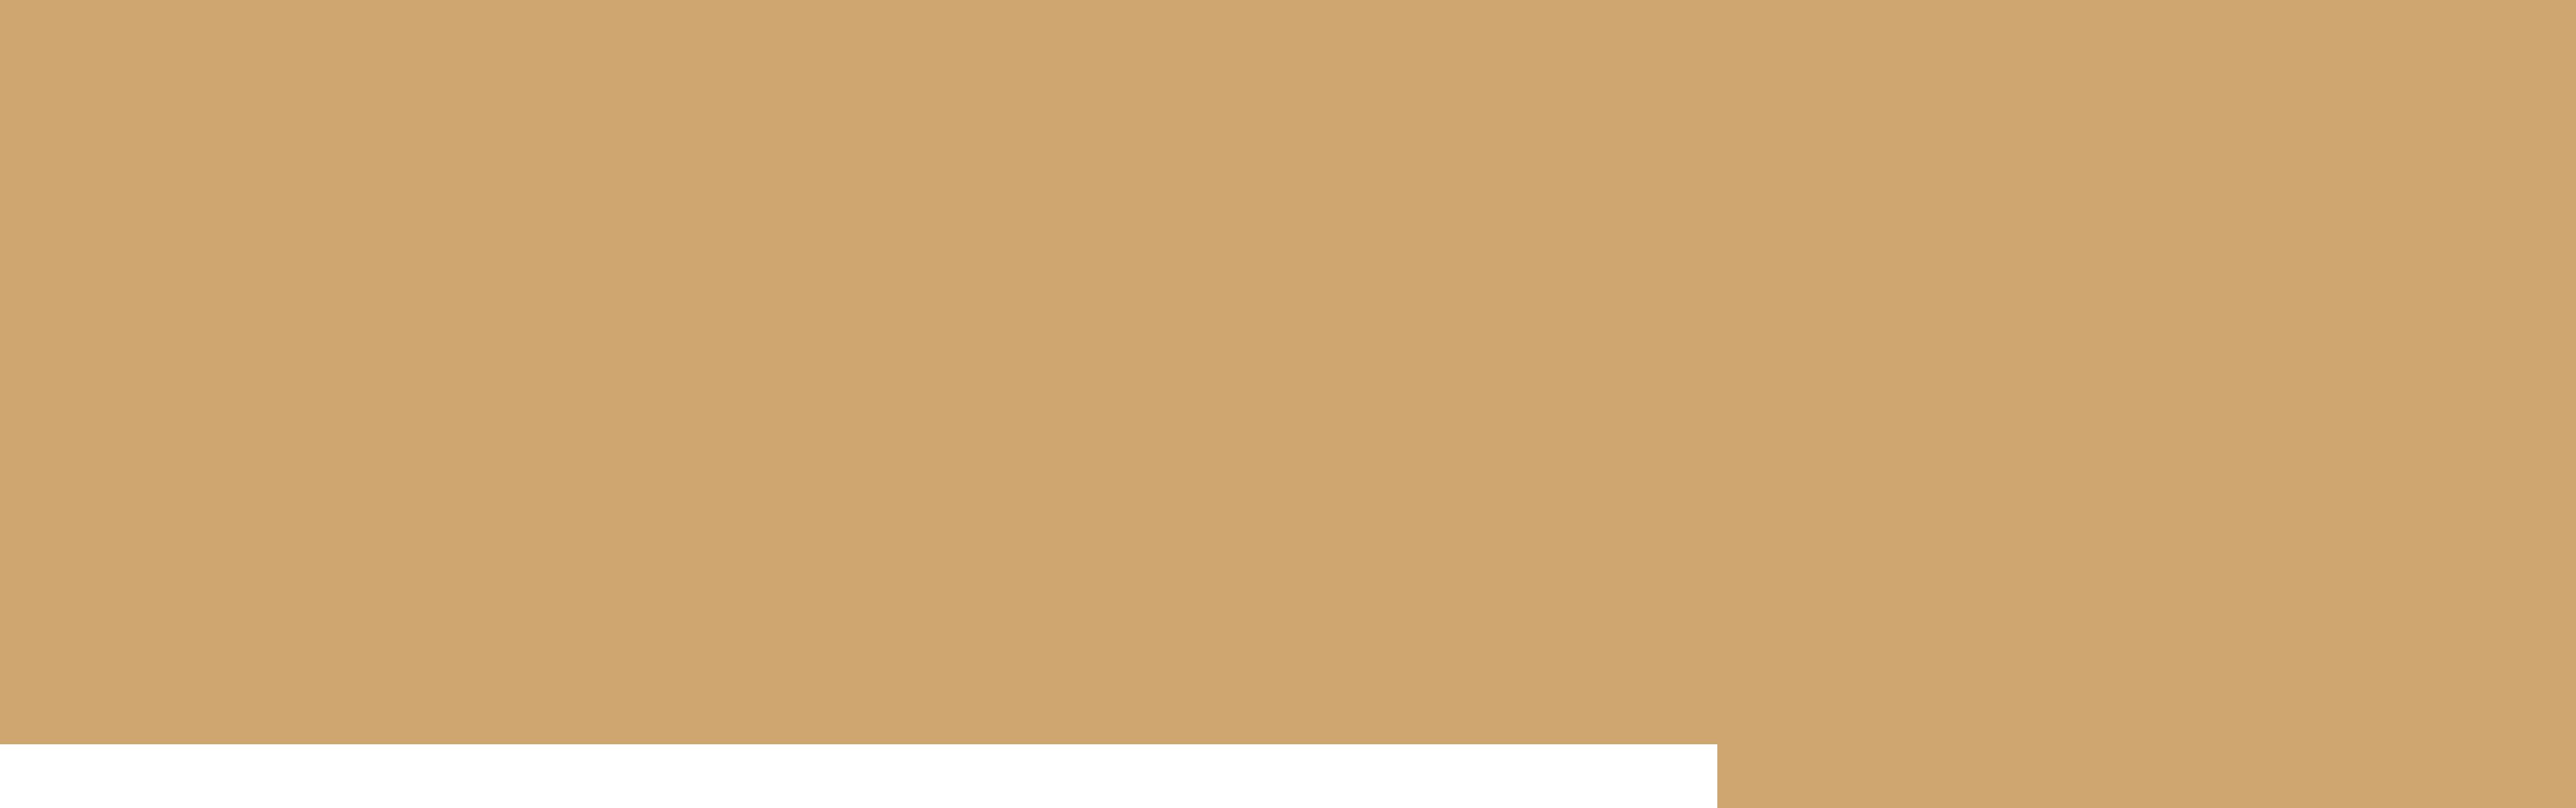 KOMFORT | Restauracja, Catering, Pizza, Organizacja wesel | MARGONIN